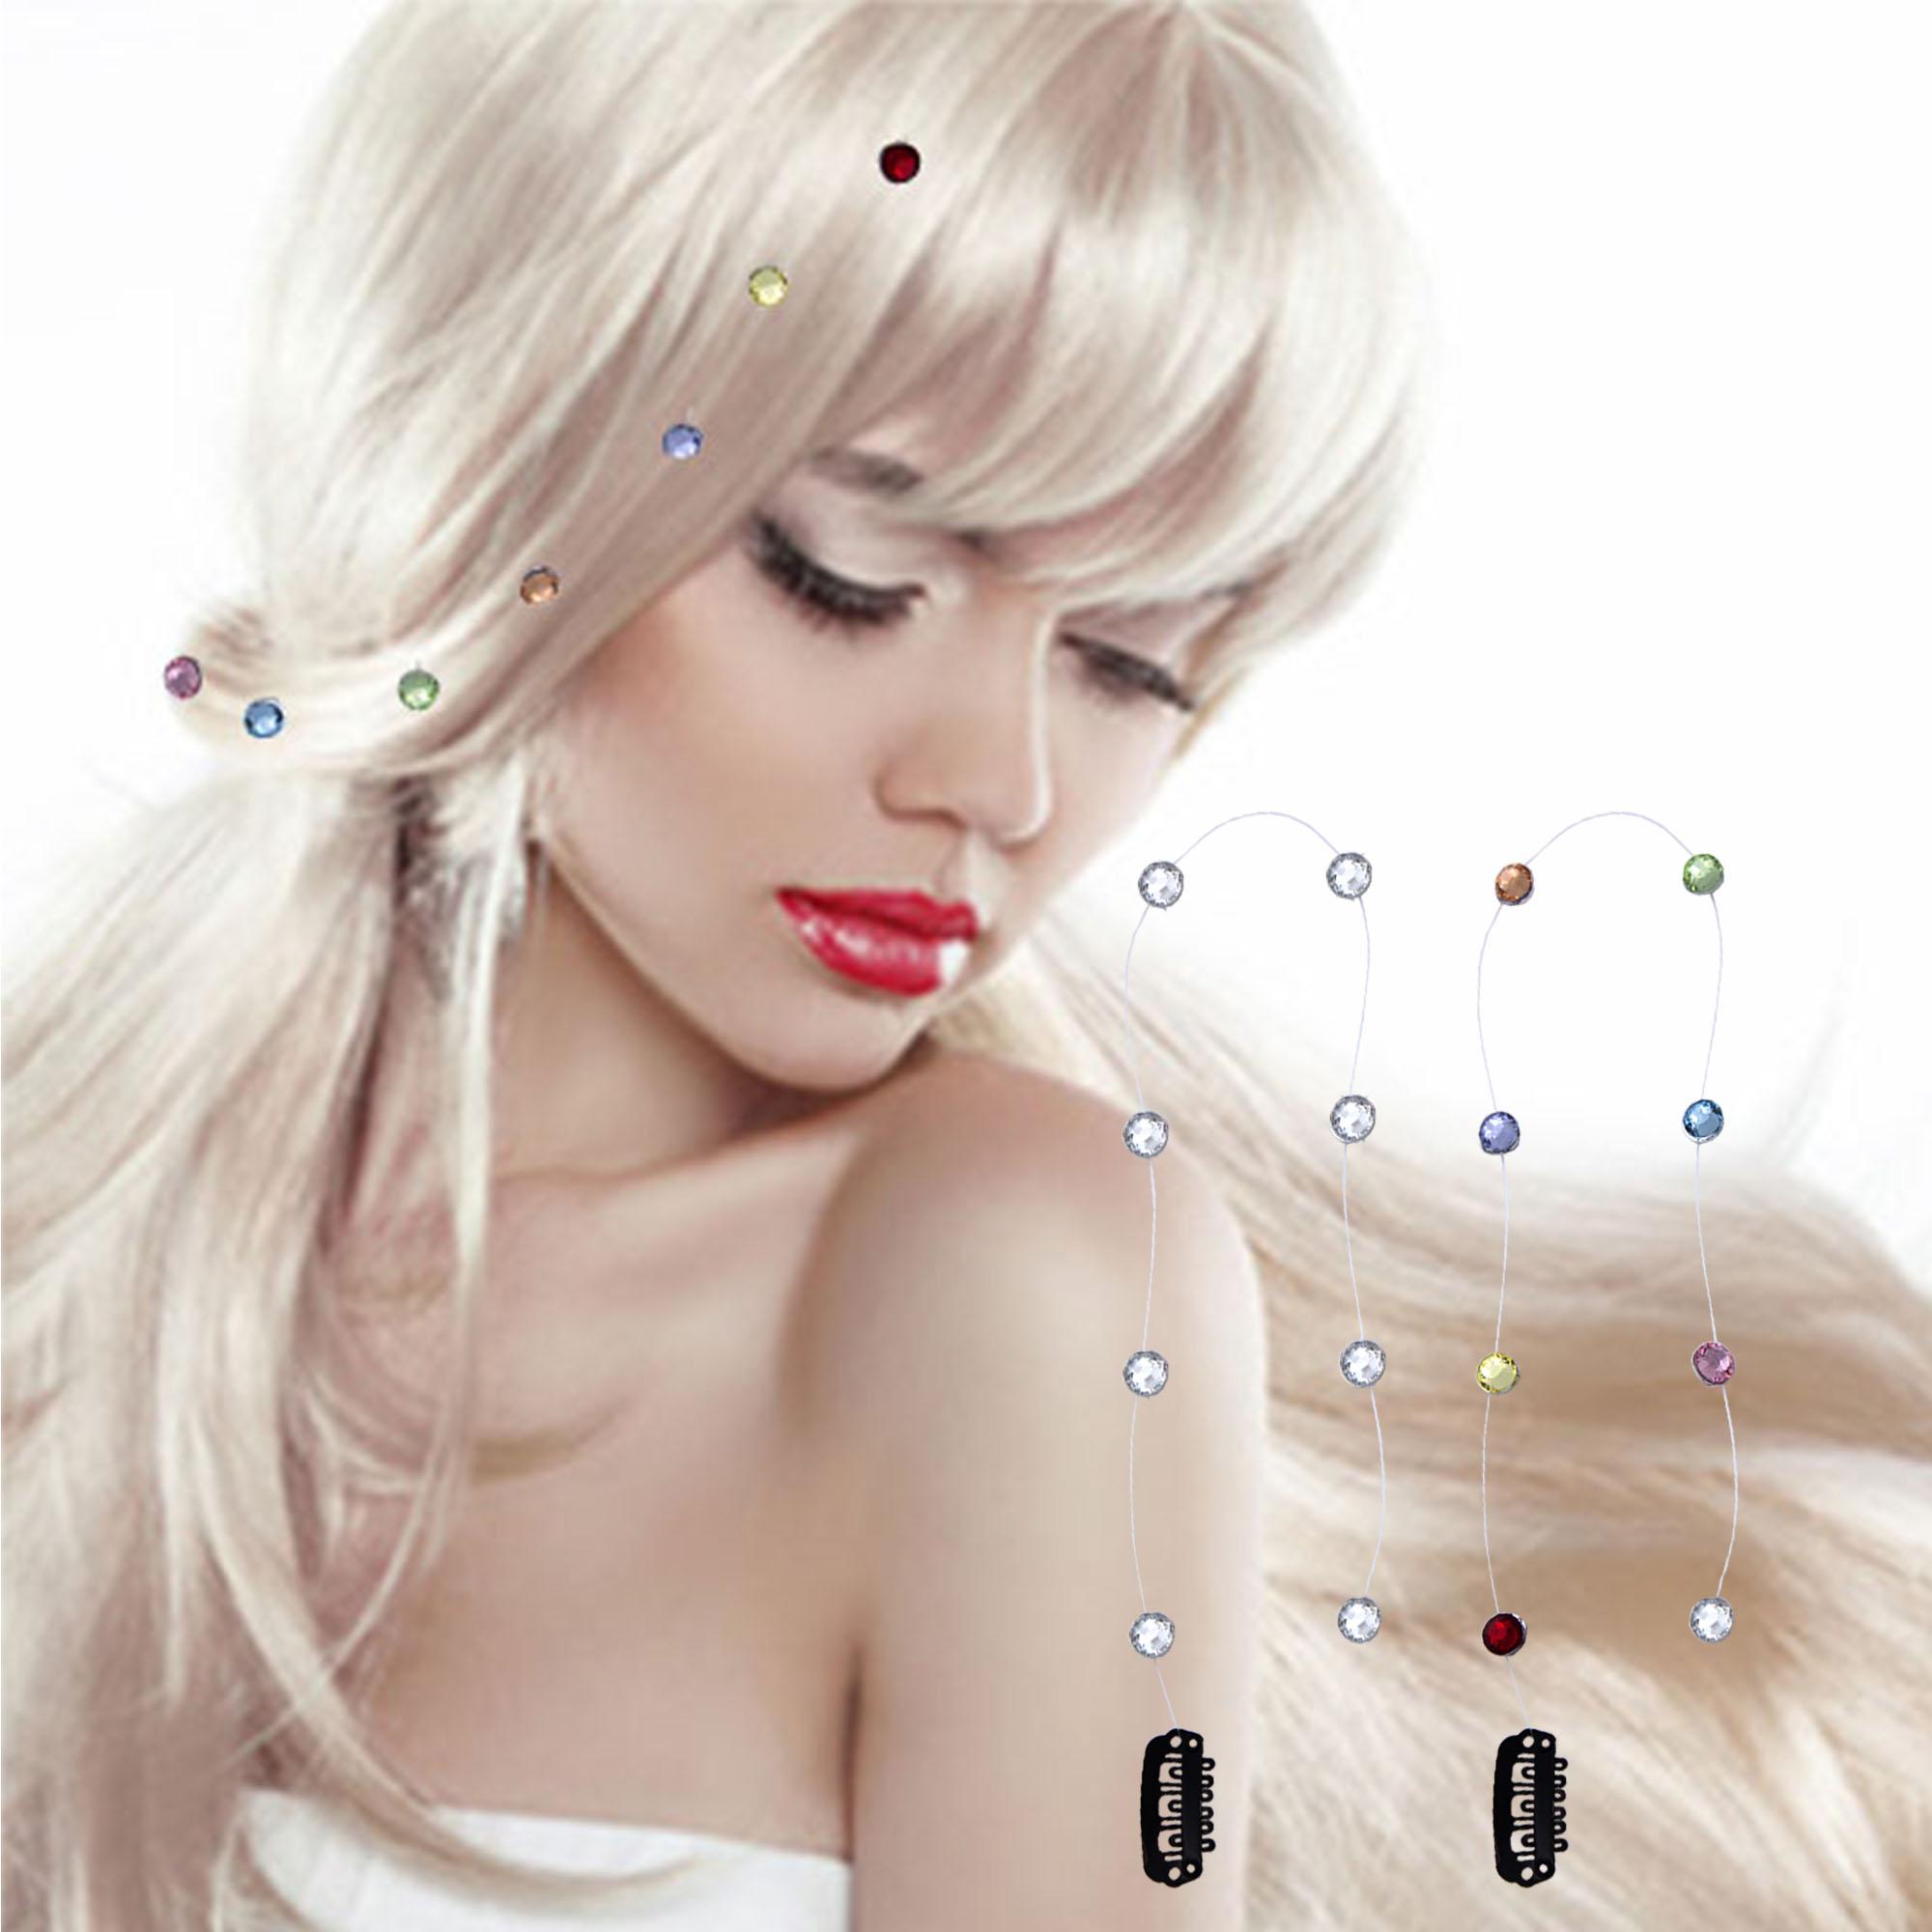 A&A Hair Beauty Haar Clip - In Extension Hairextensions Hairclip Clip Clips Strähnen Toupet Kämmchen